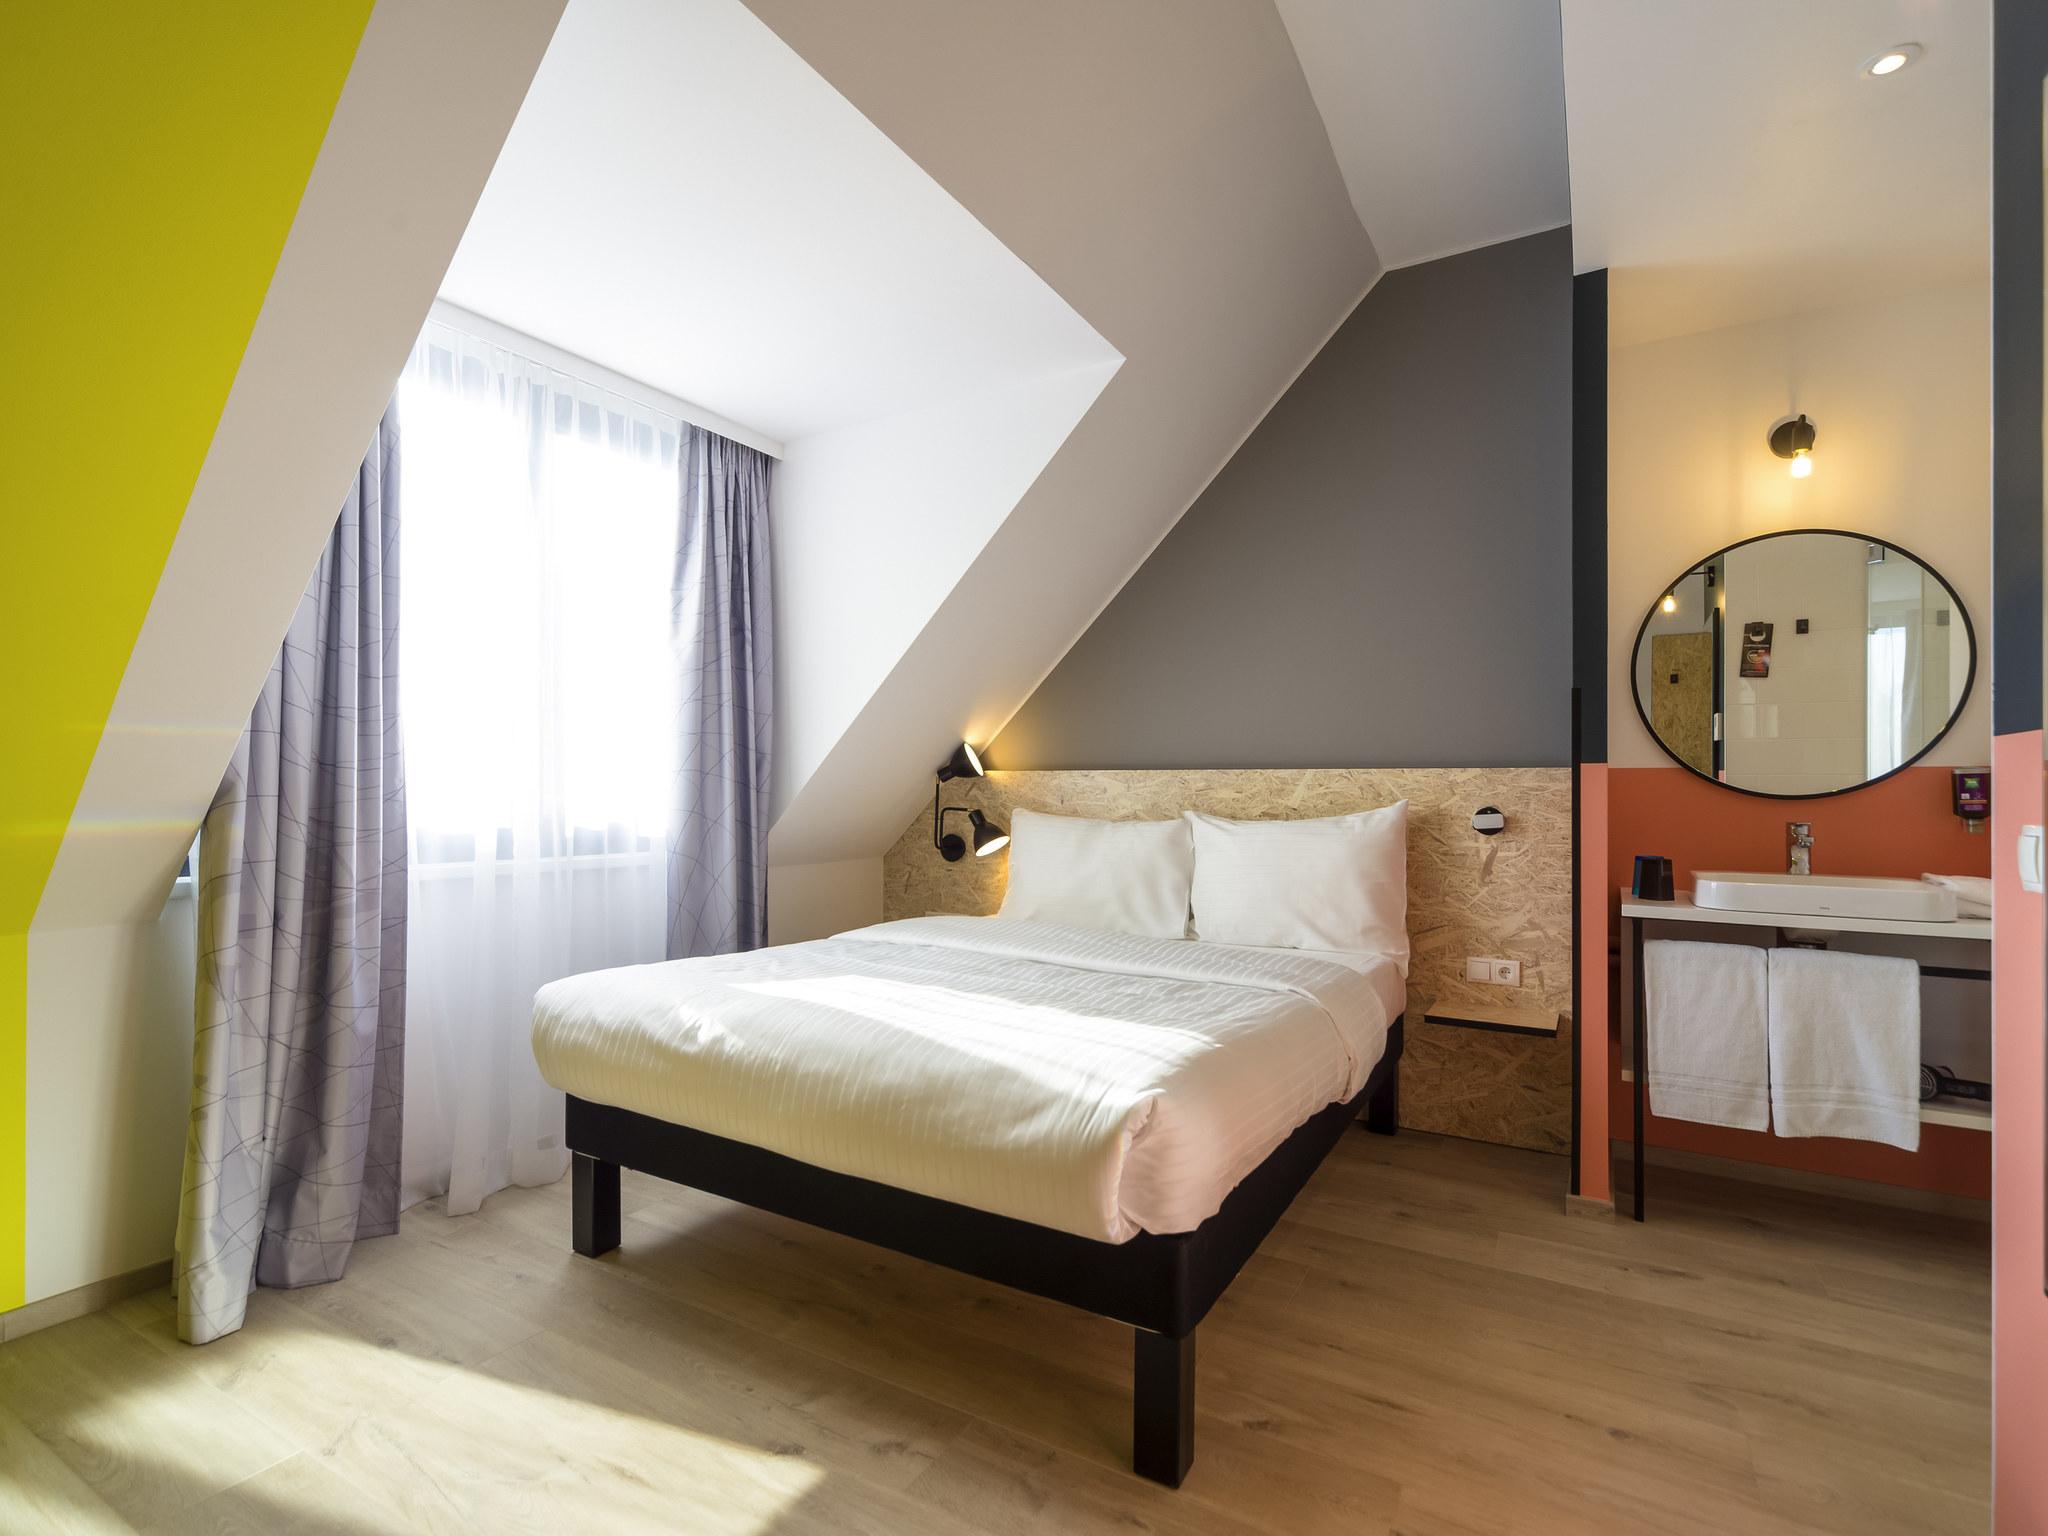 Hotel – ibis Styles Wien Messe Prater (otwarcie w listopadzie 2018 roku)